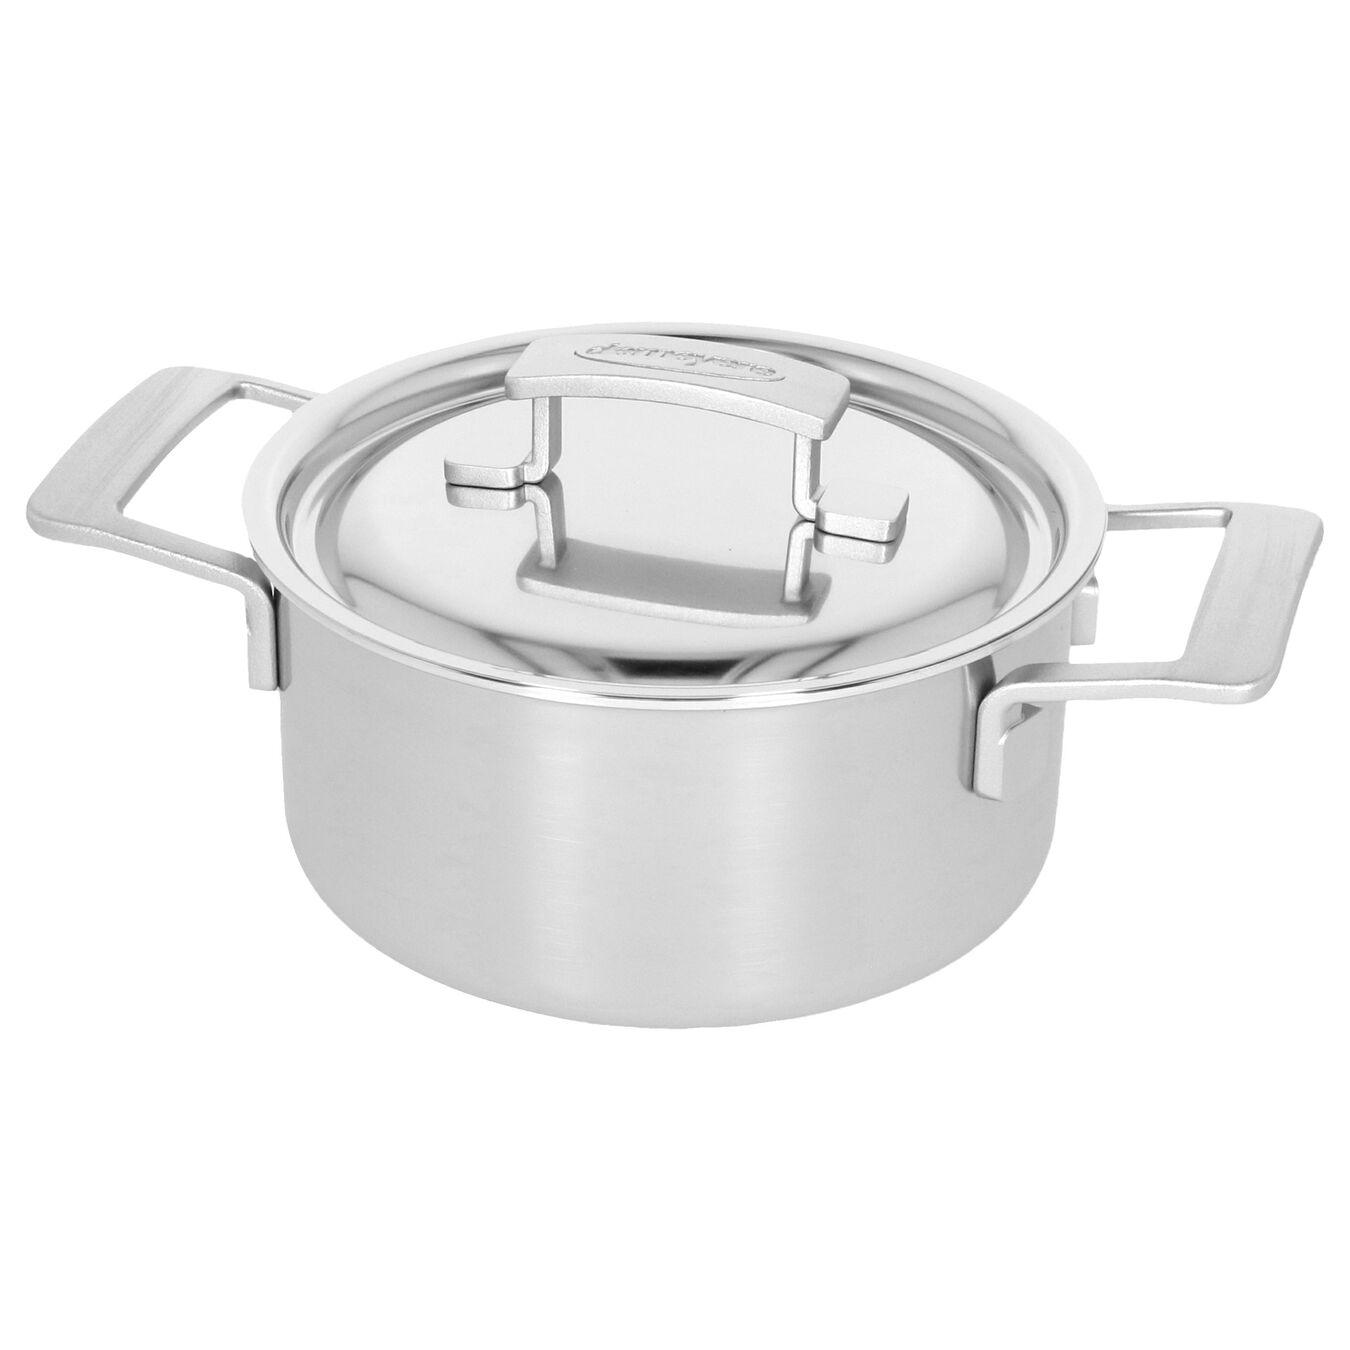 Kookpot met deksel 18 cm / 2,25 l,,large 2